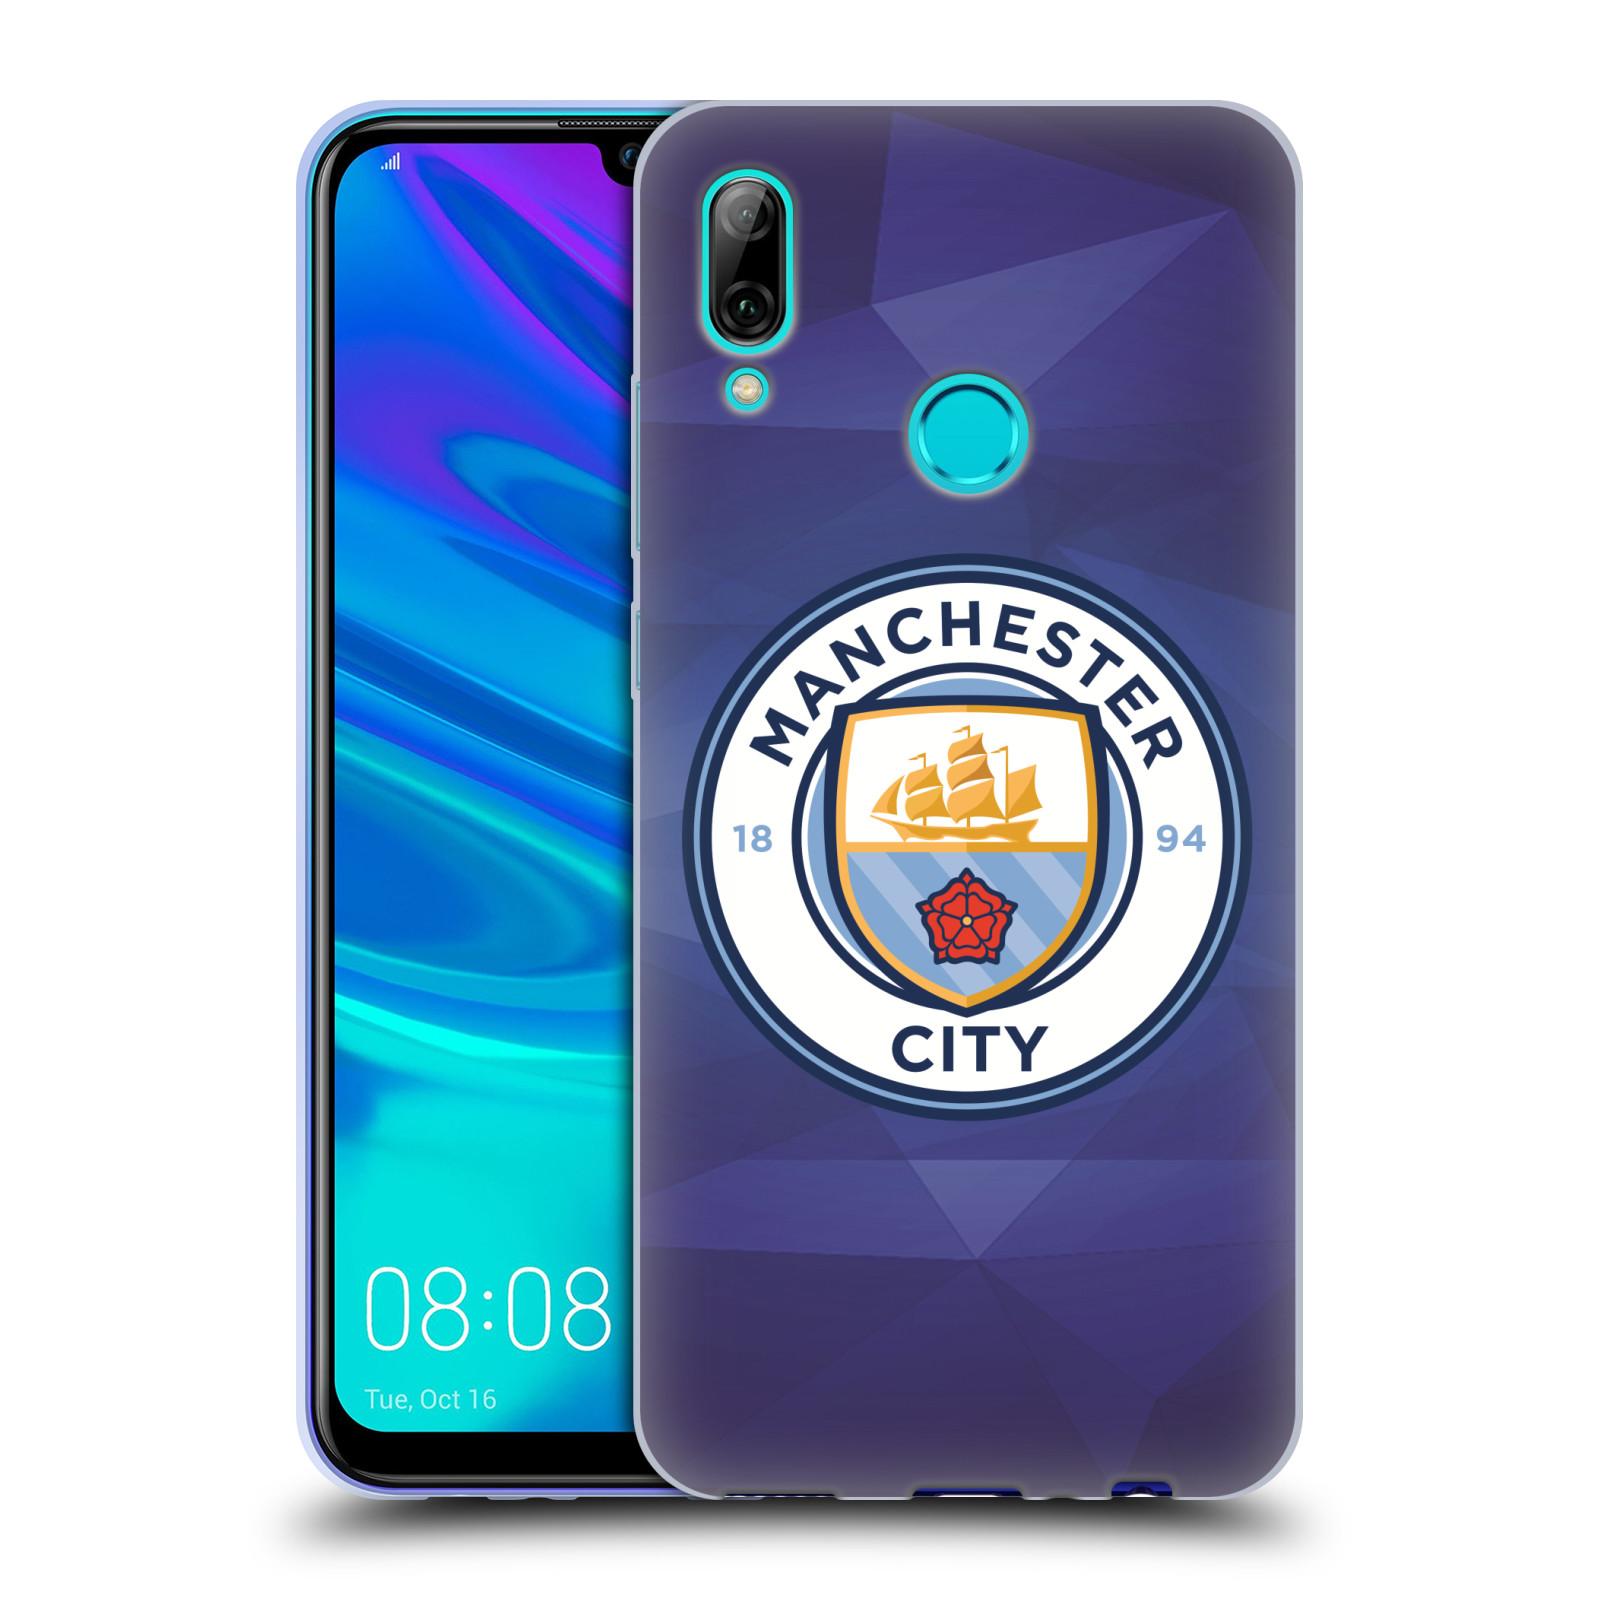 Silikonové pouzdro na mobil Huawei P Smart (2019) - Head Case - Manchester City FC - Modré nové logo